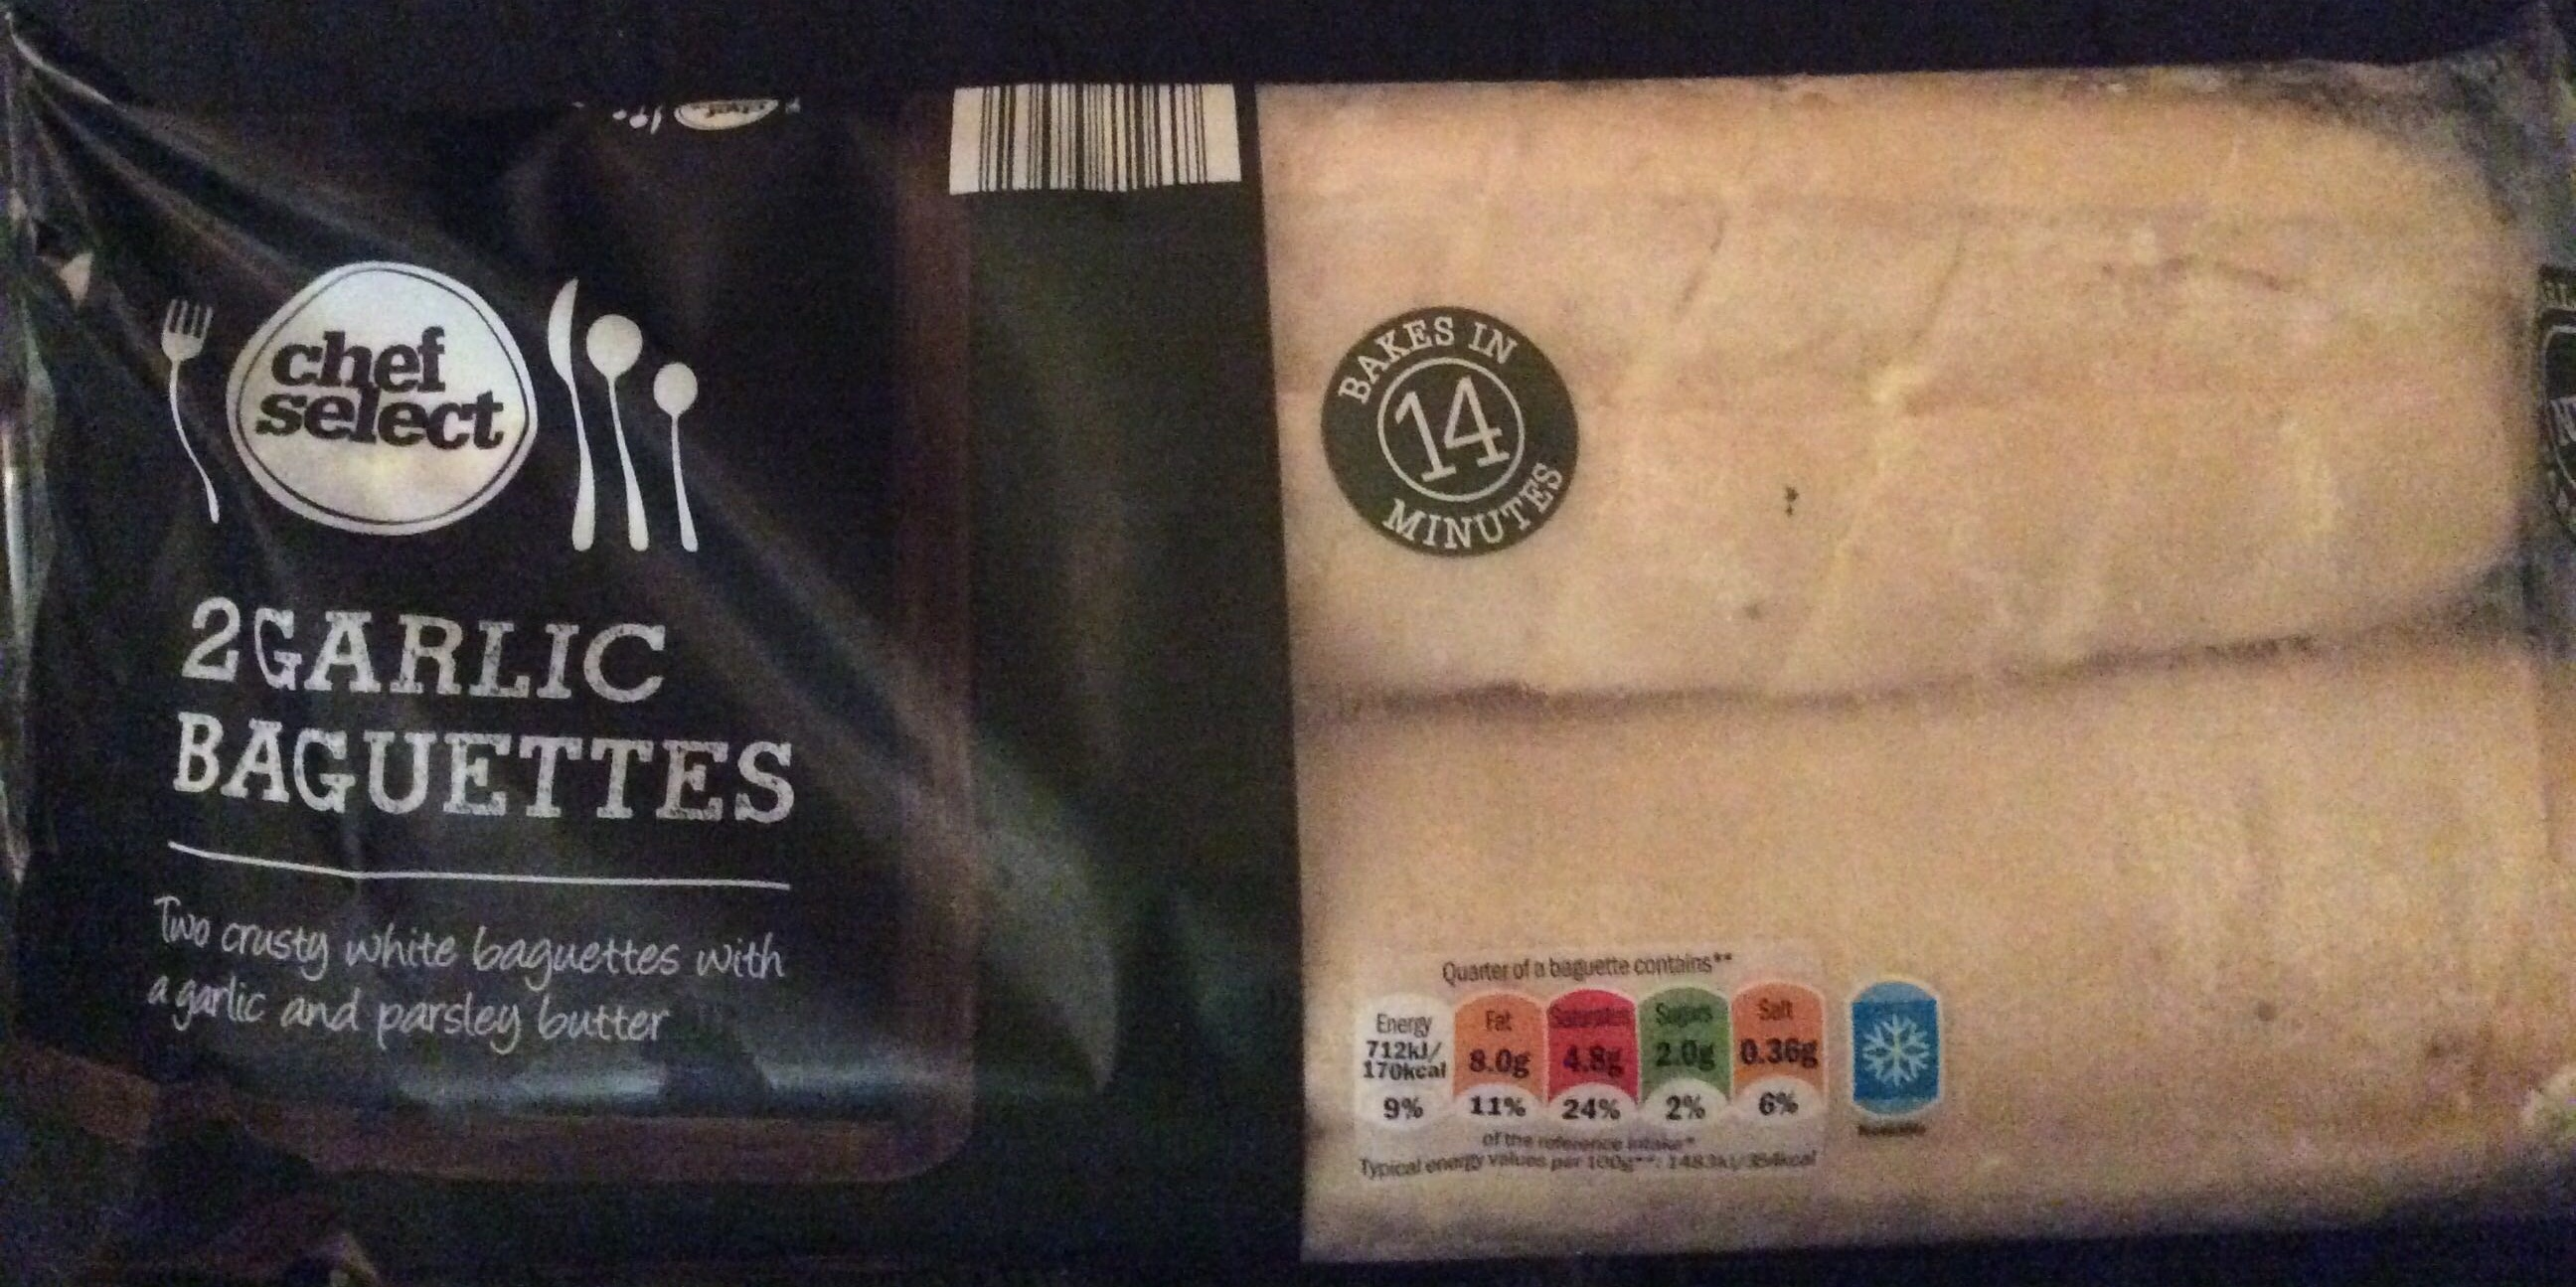 Garlic Baguettes - Product